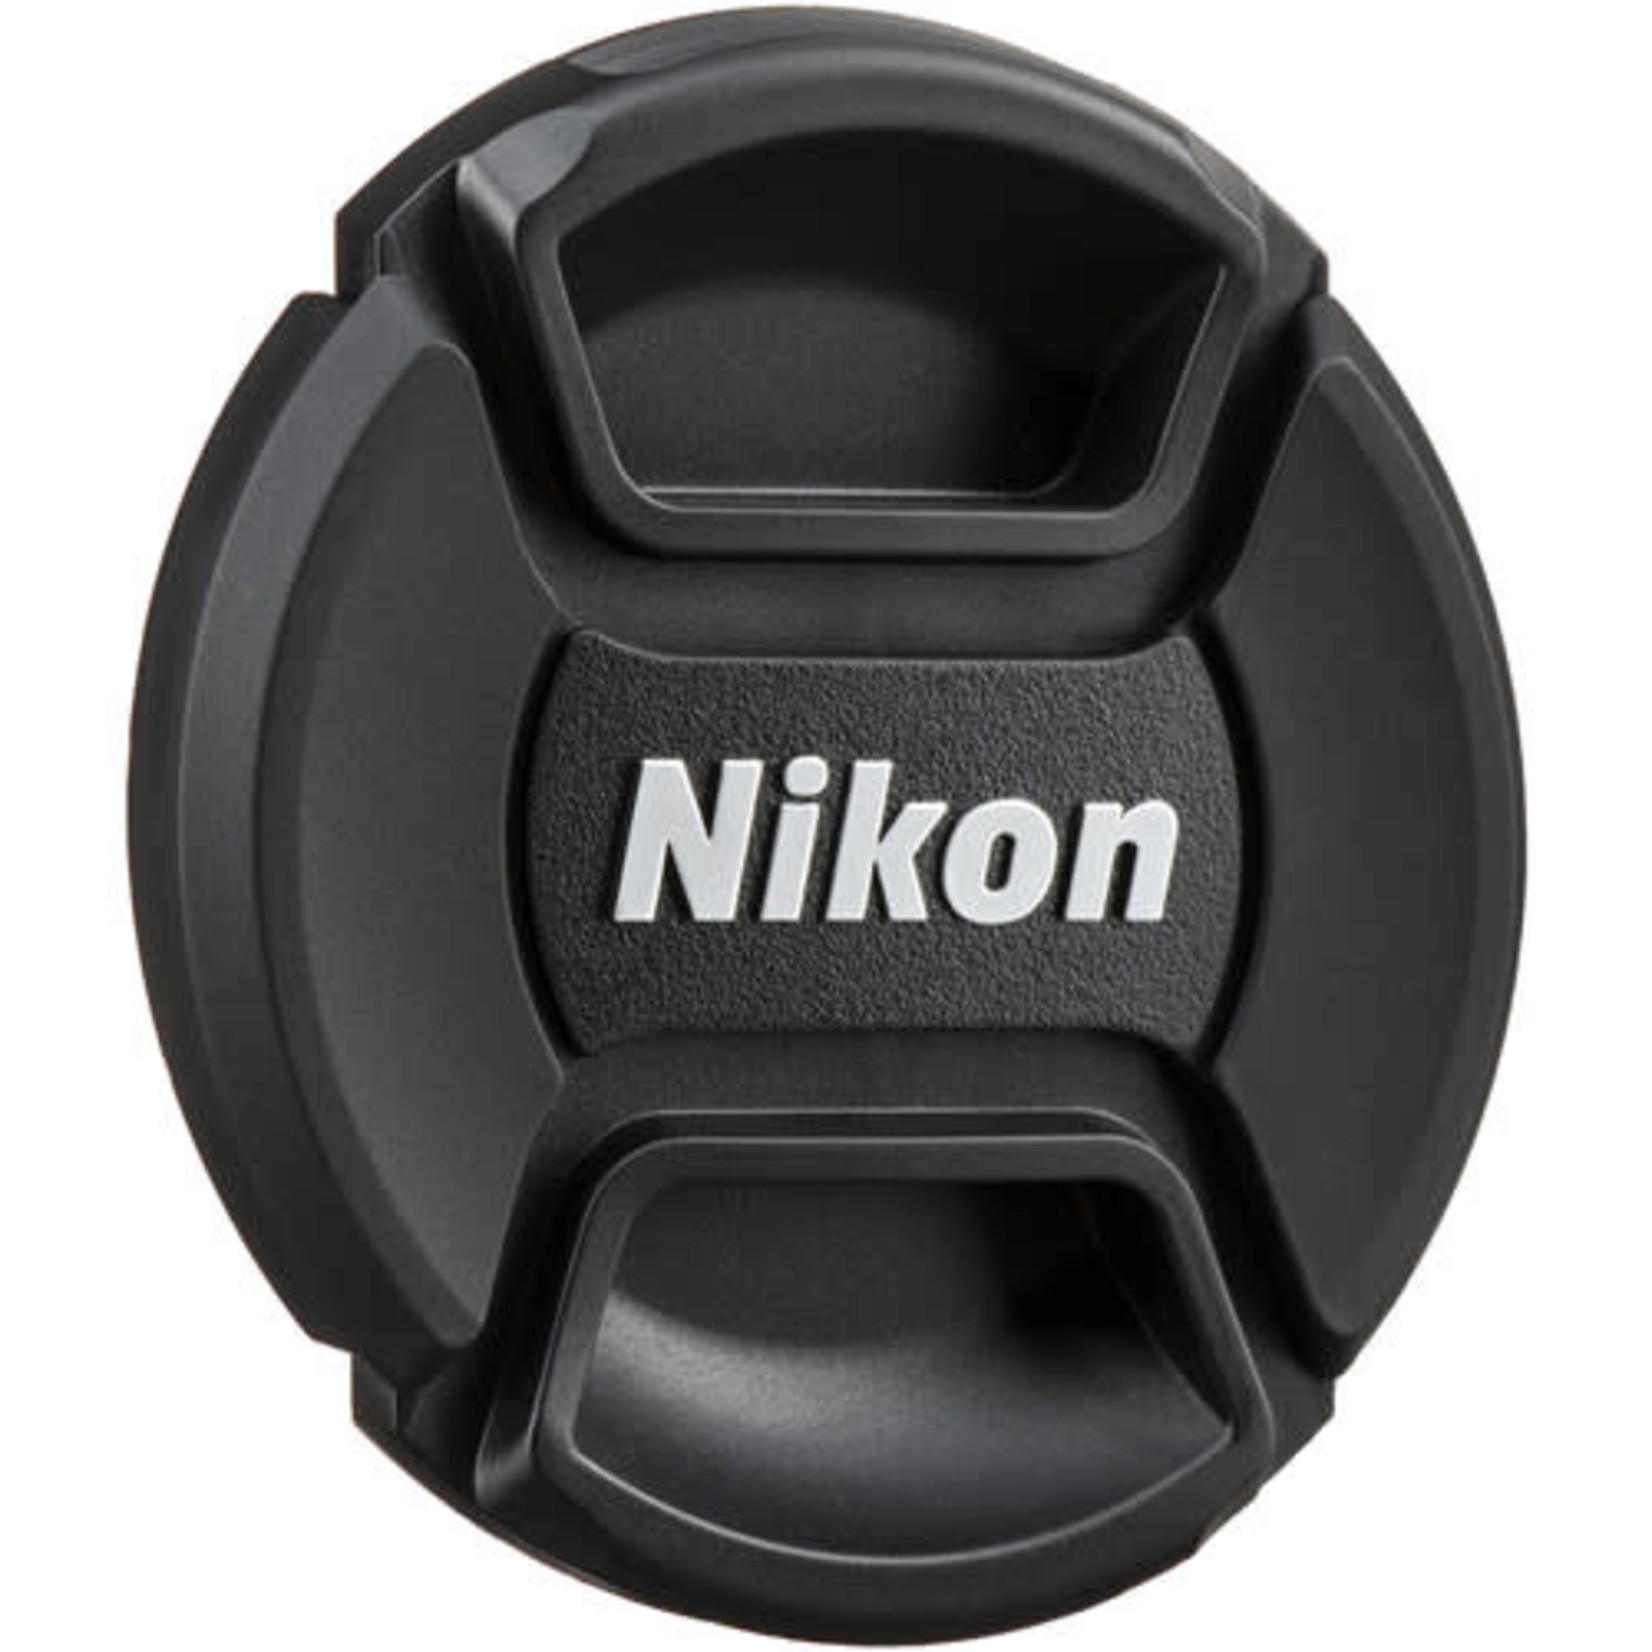 Nikon Nikon 62mm Snap-On Lens Cap